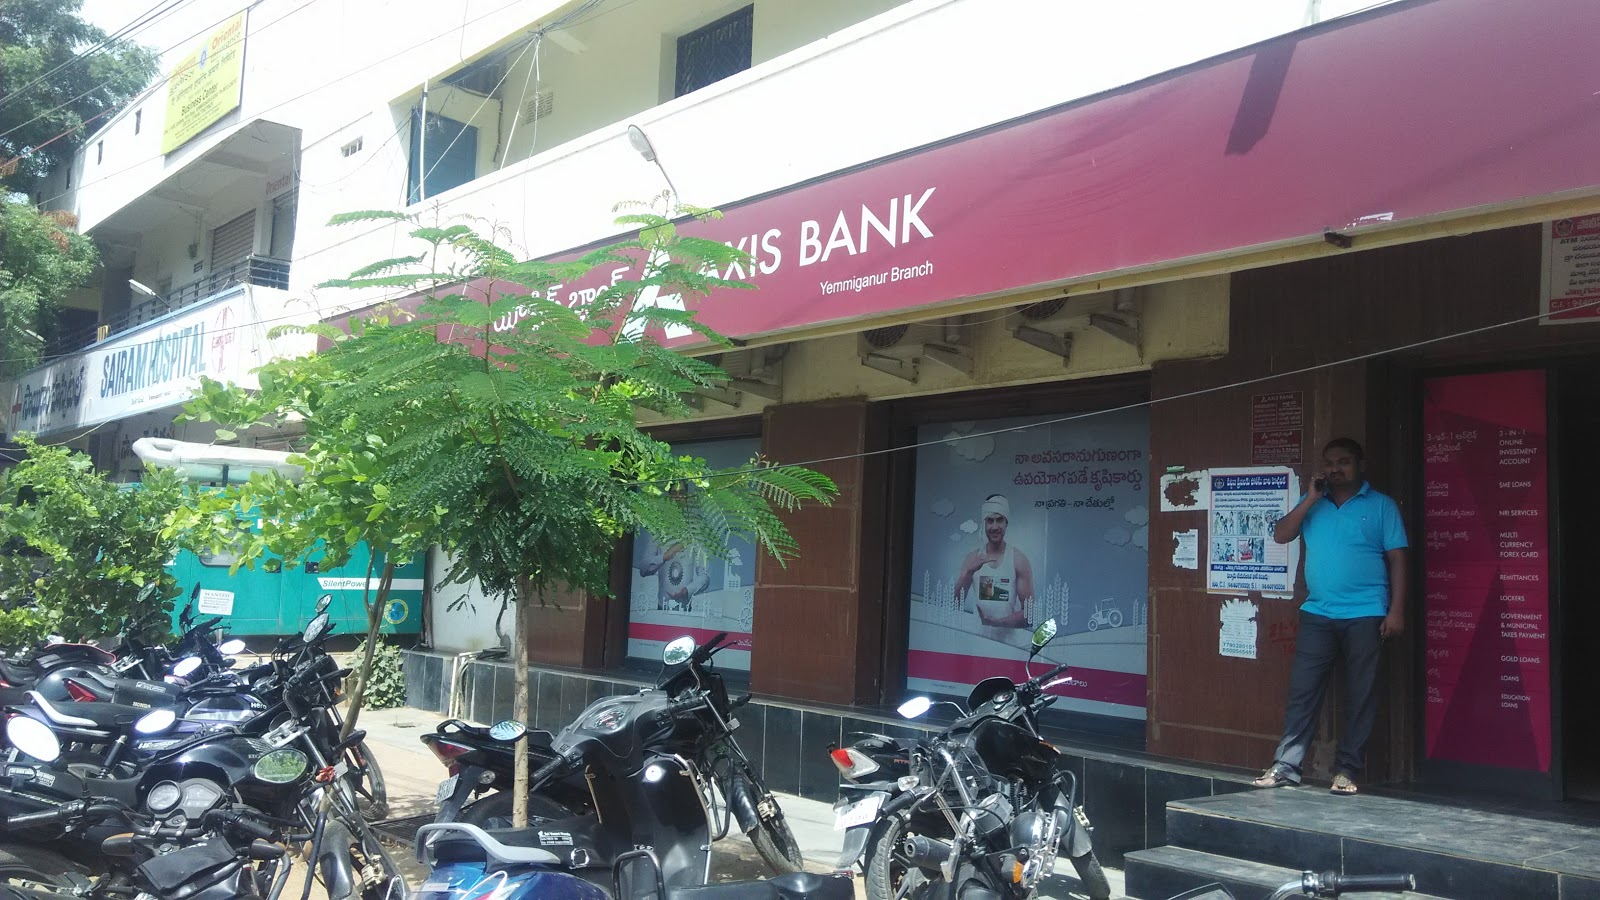 blood bank Axis Bank near Yemmiganur Andhra Pradesh